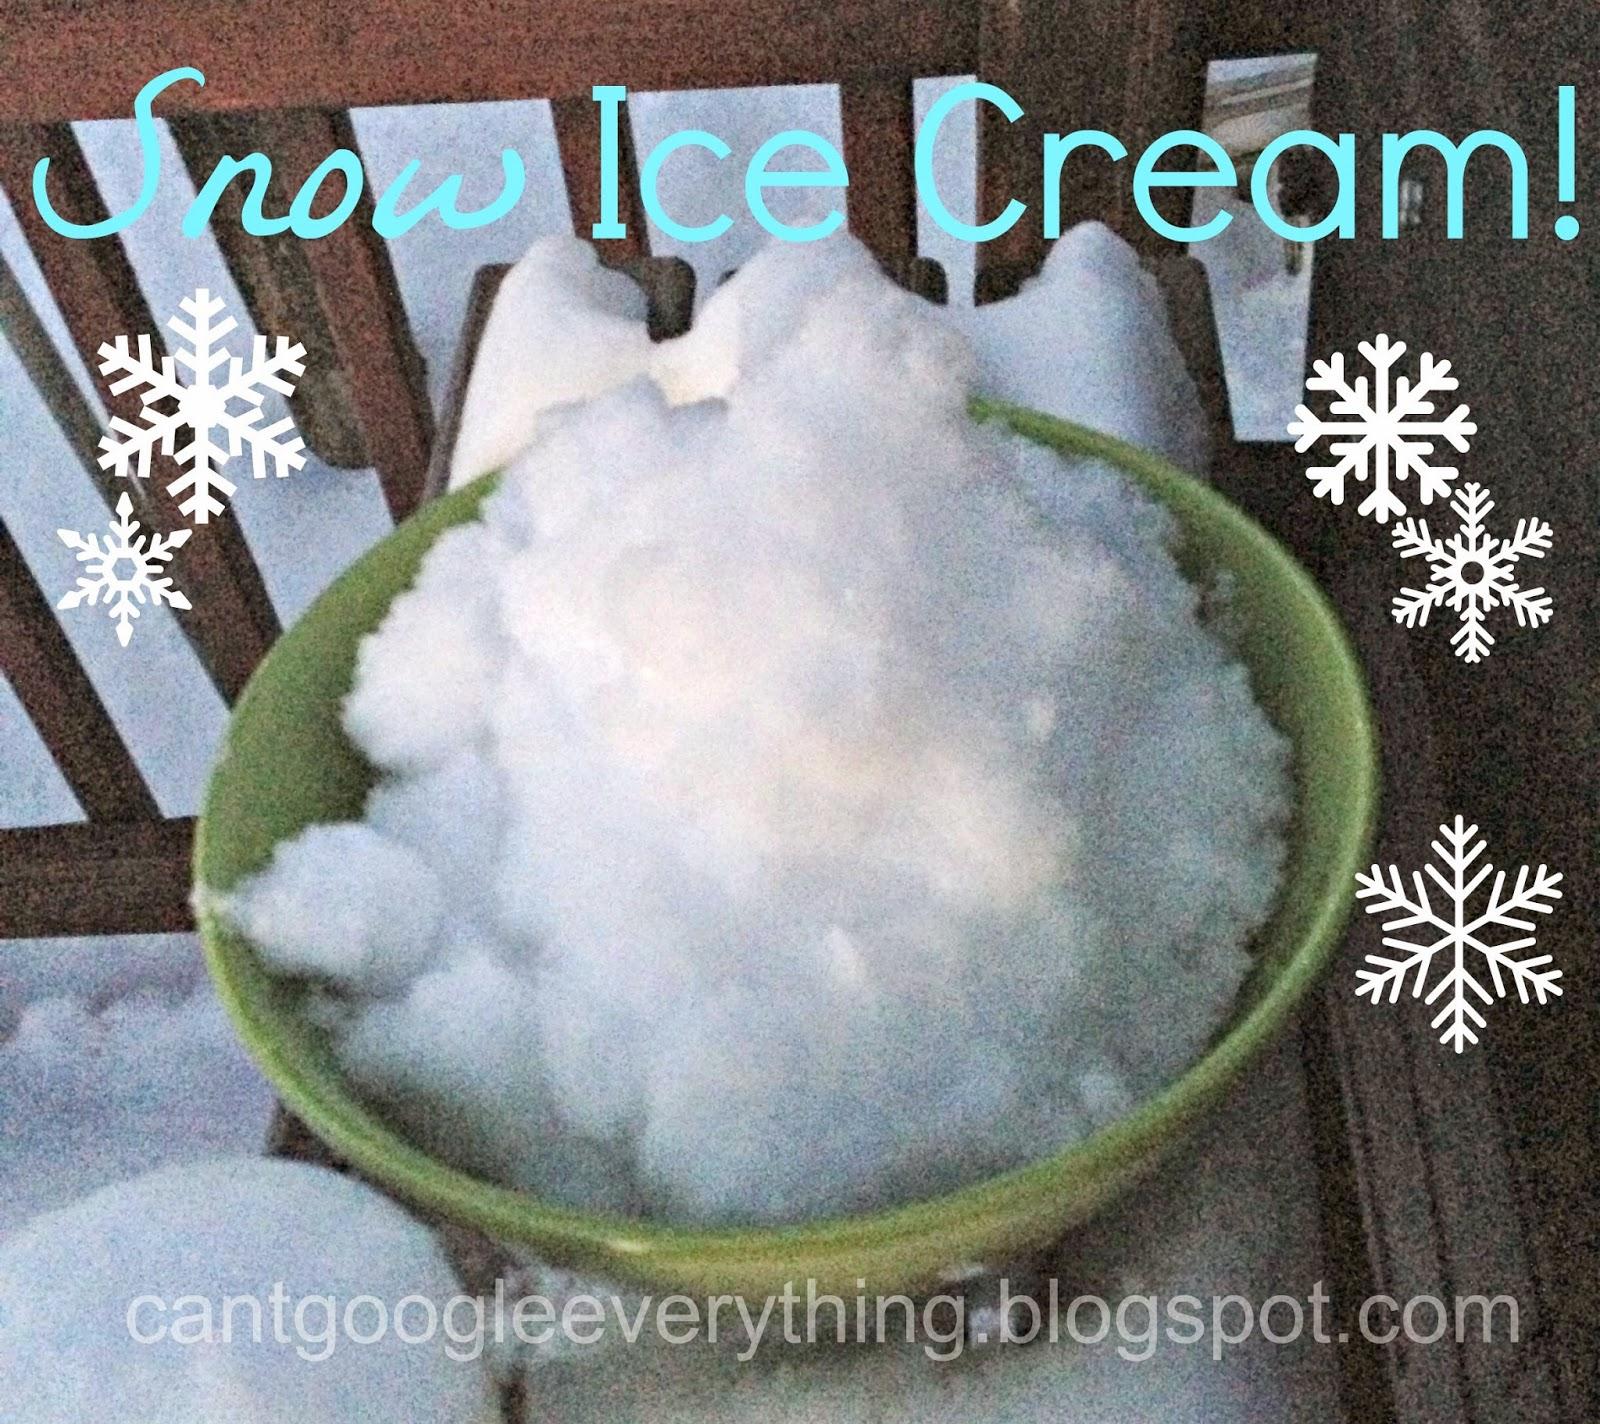 http://cantgoogleeverything.blogspot.com/2014/01/snow-ice-cream.html